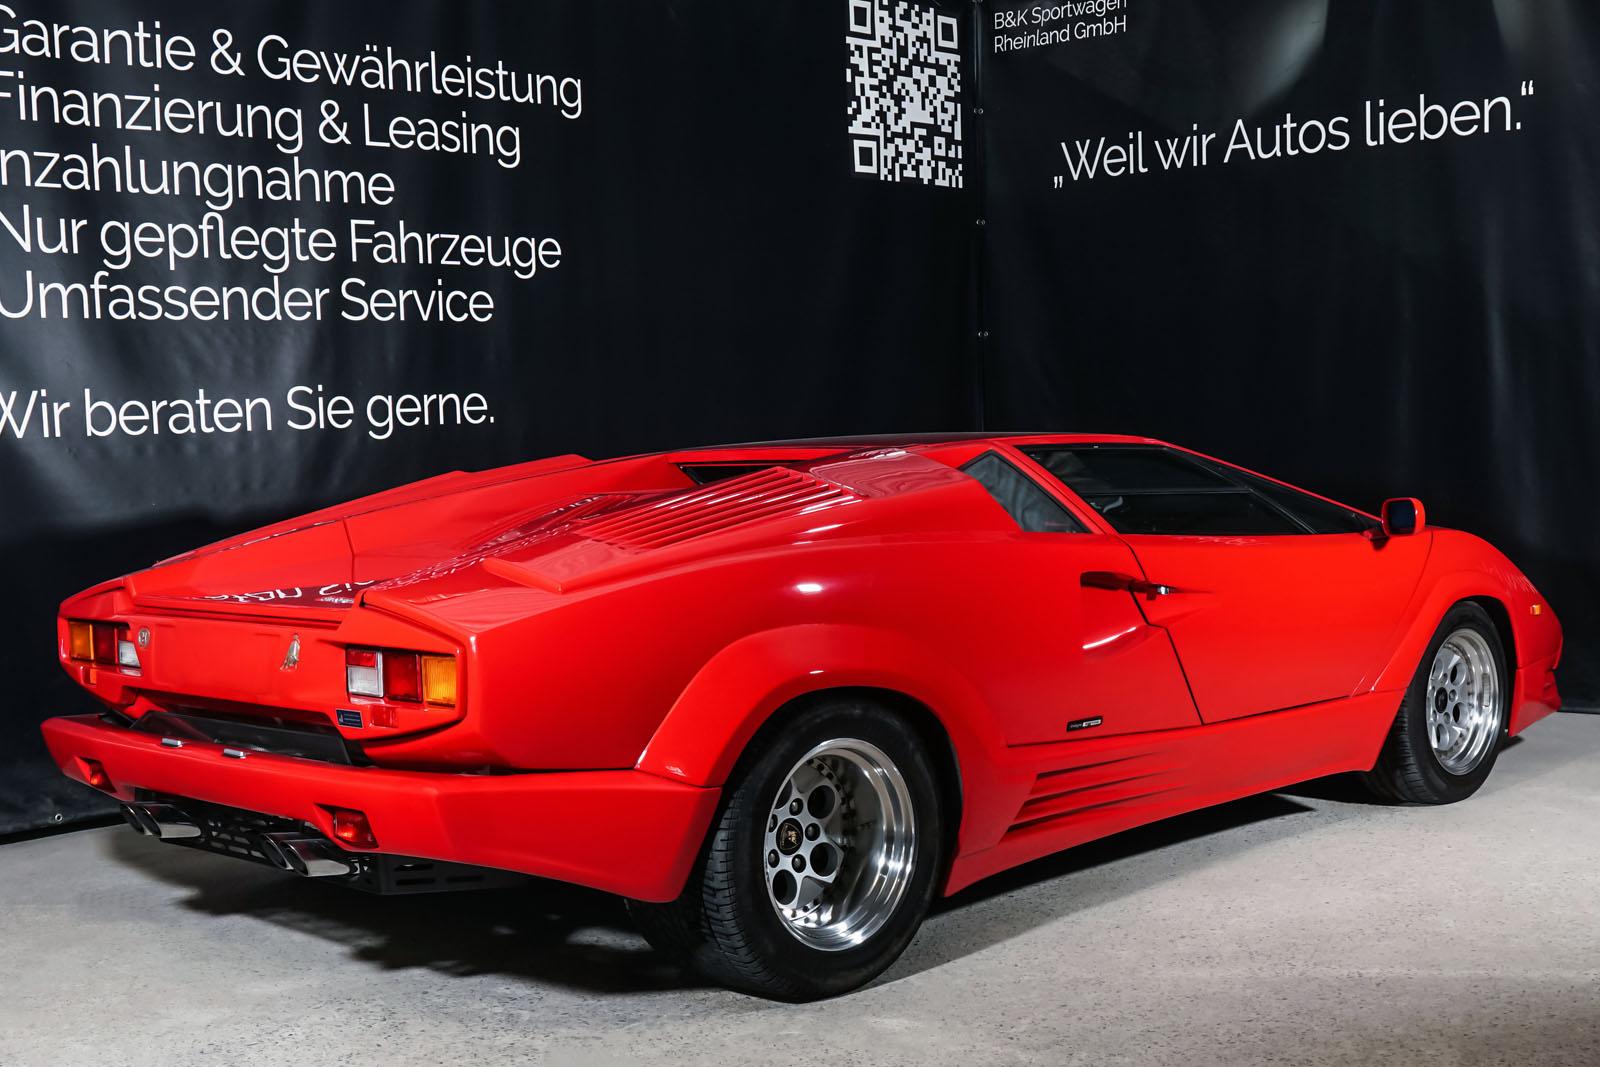 Lamborghini_Countach_Rot_Schwarz_LAM-2811_17_w